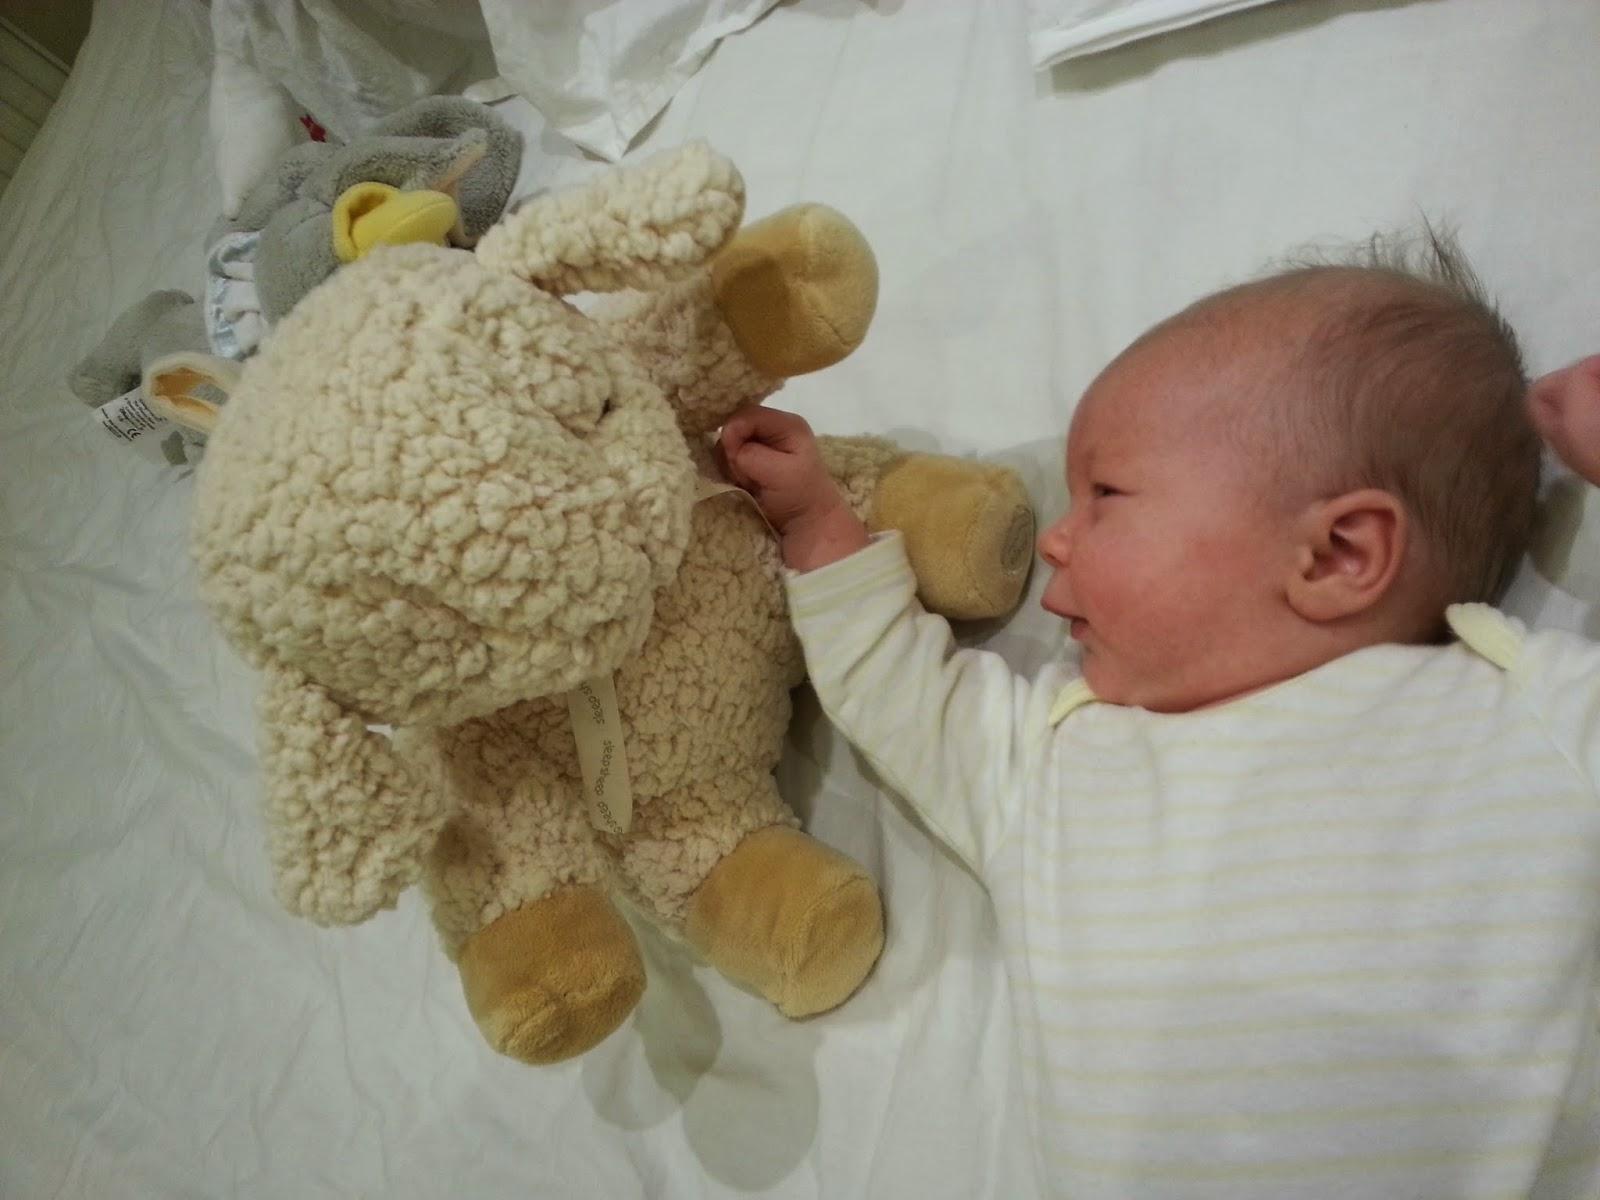 http://cloudb.com/UK/sound/sleep-sheep